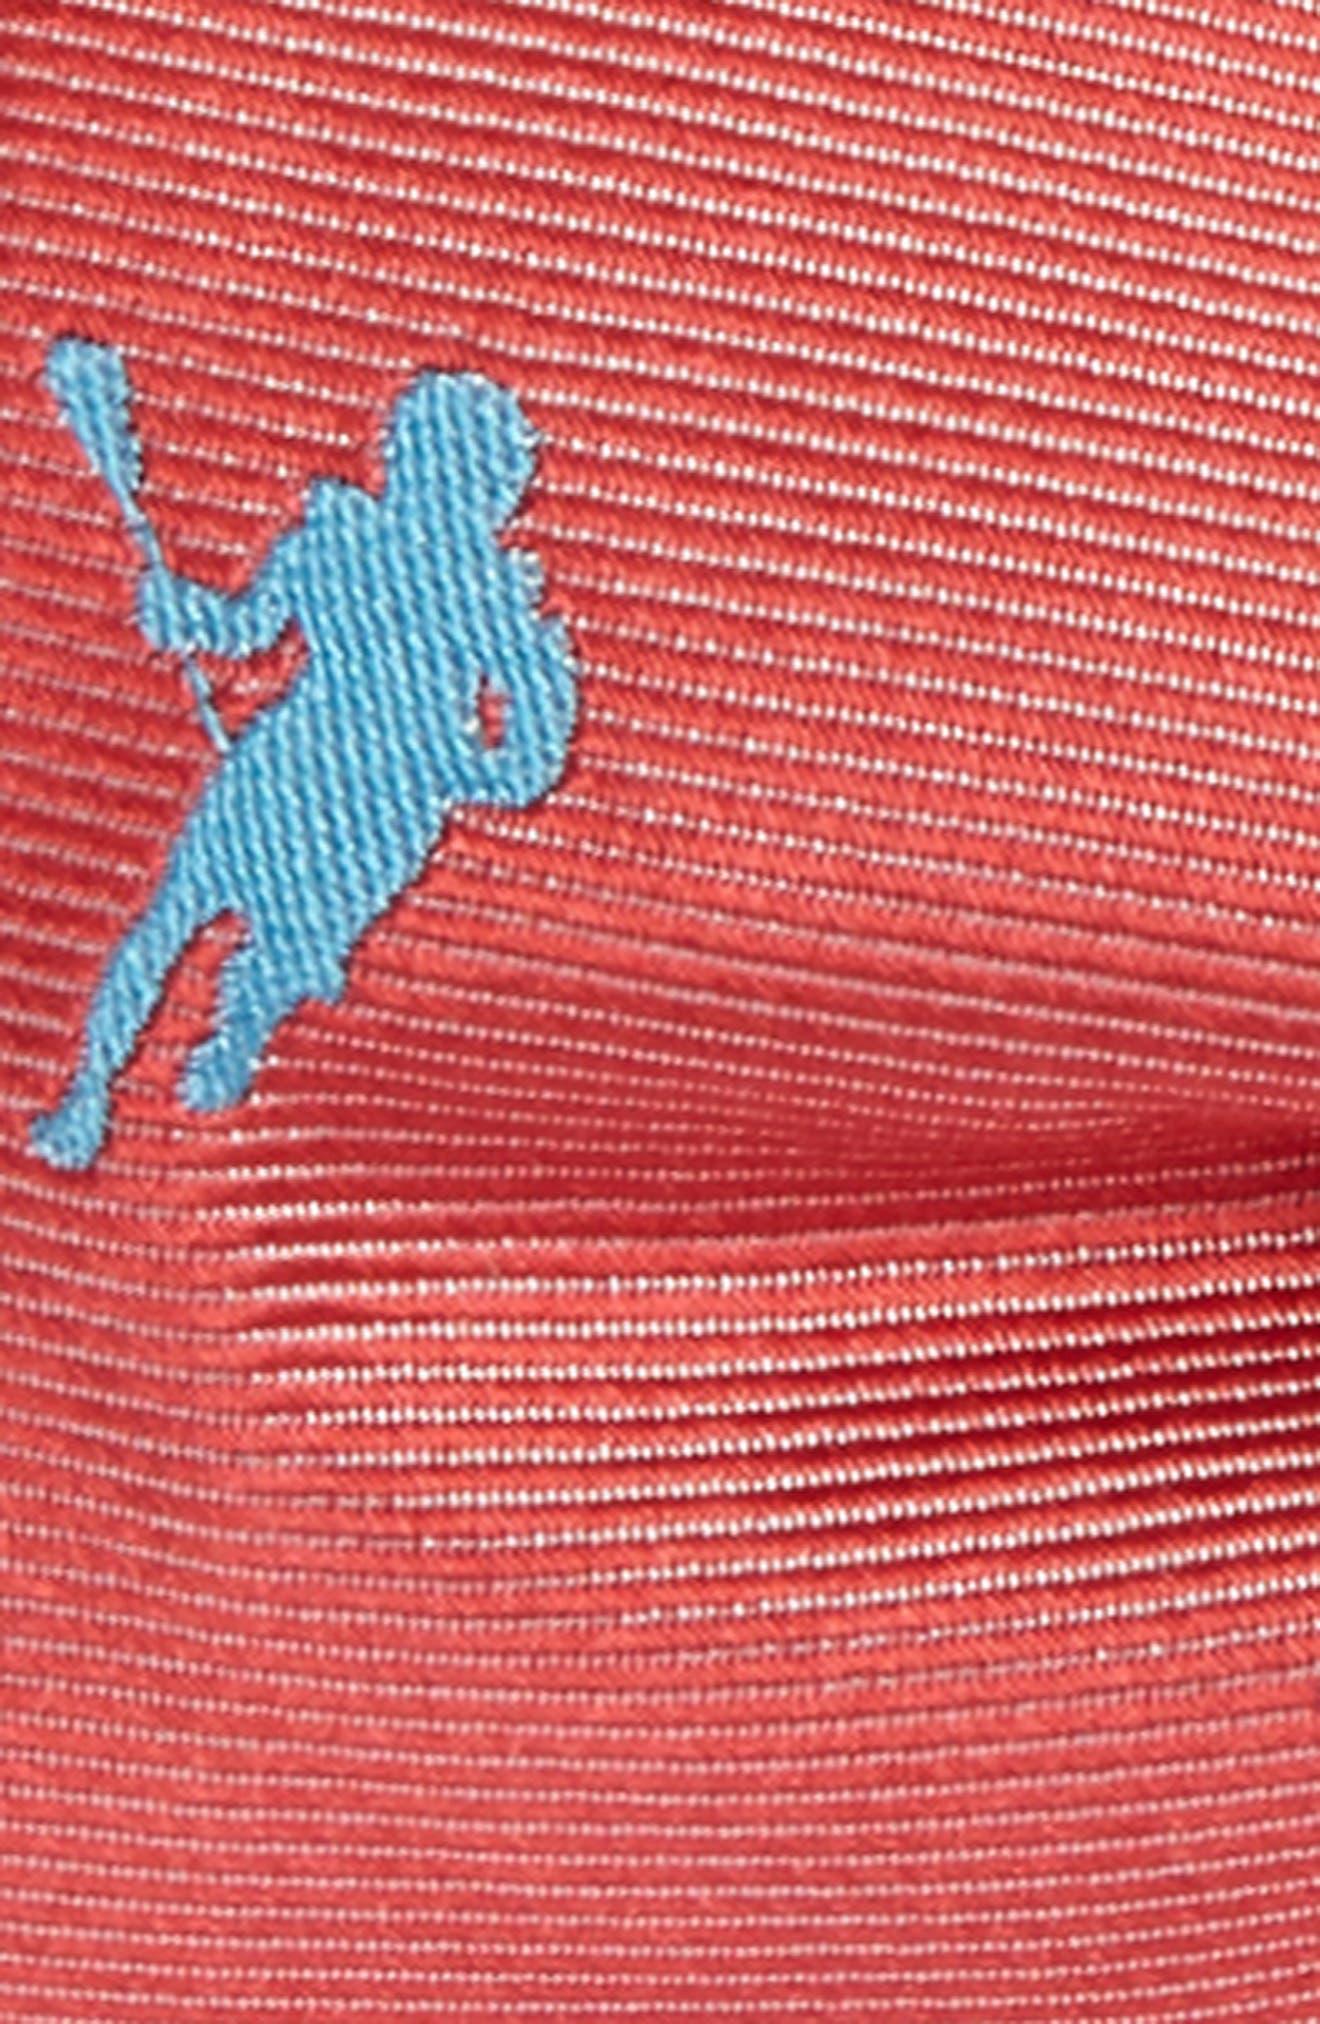 Littleton Lacrosse Silk Bow Tie,                             Alternate thumbnail 2, color,                             Coral